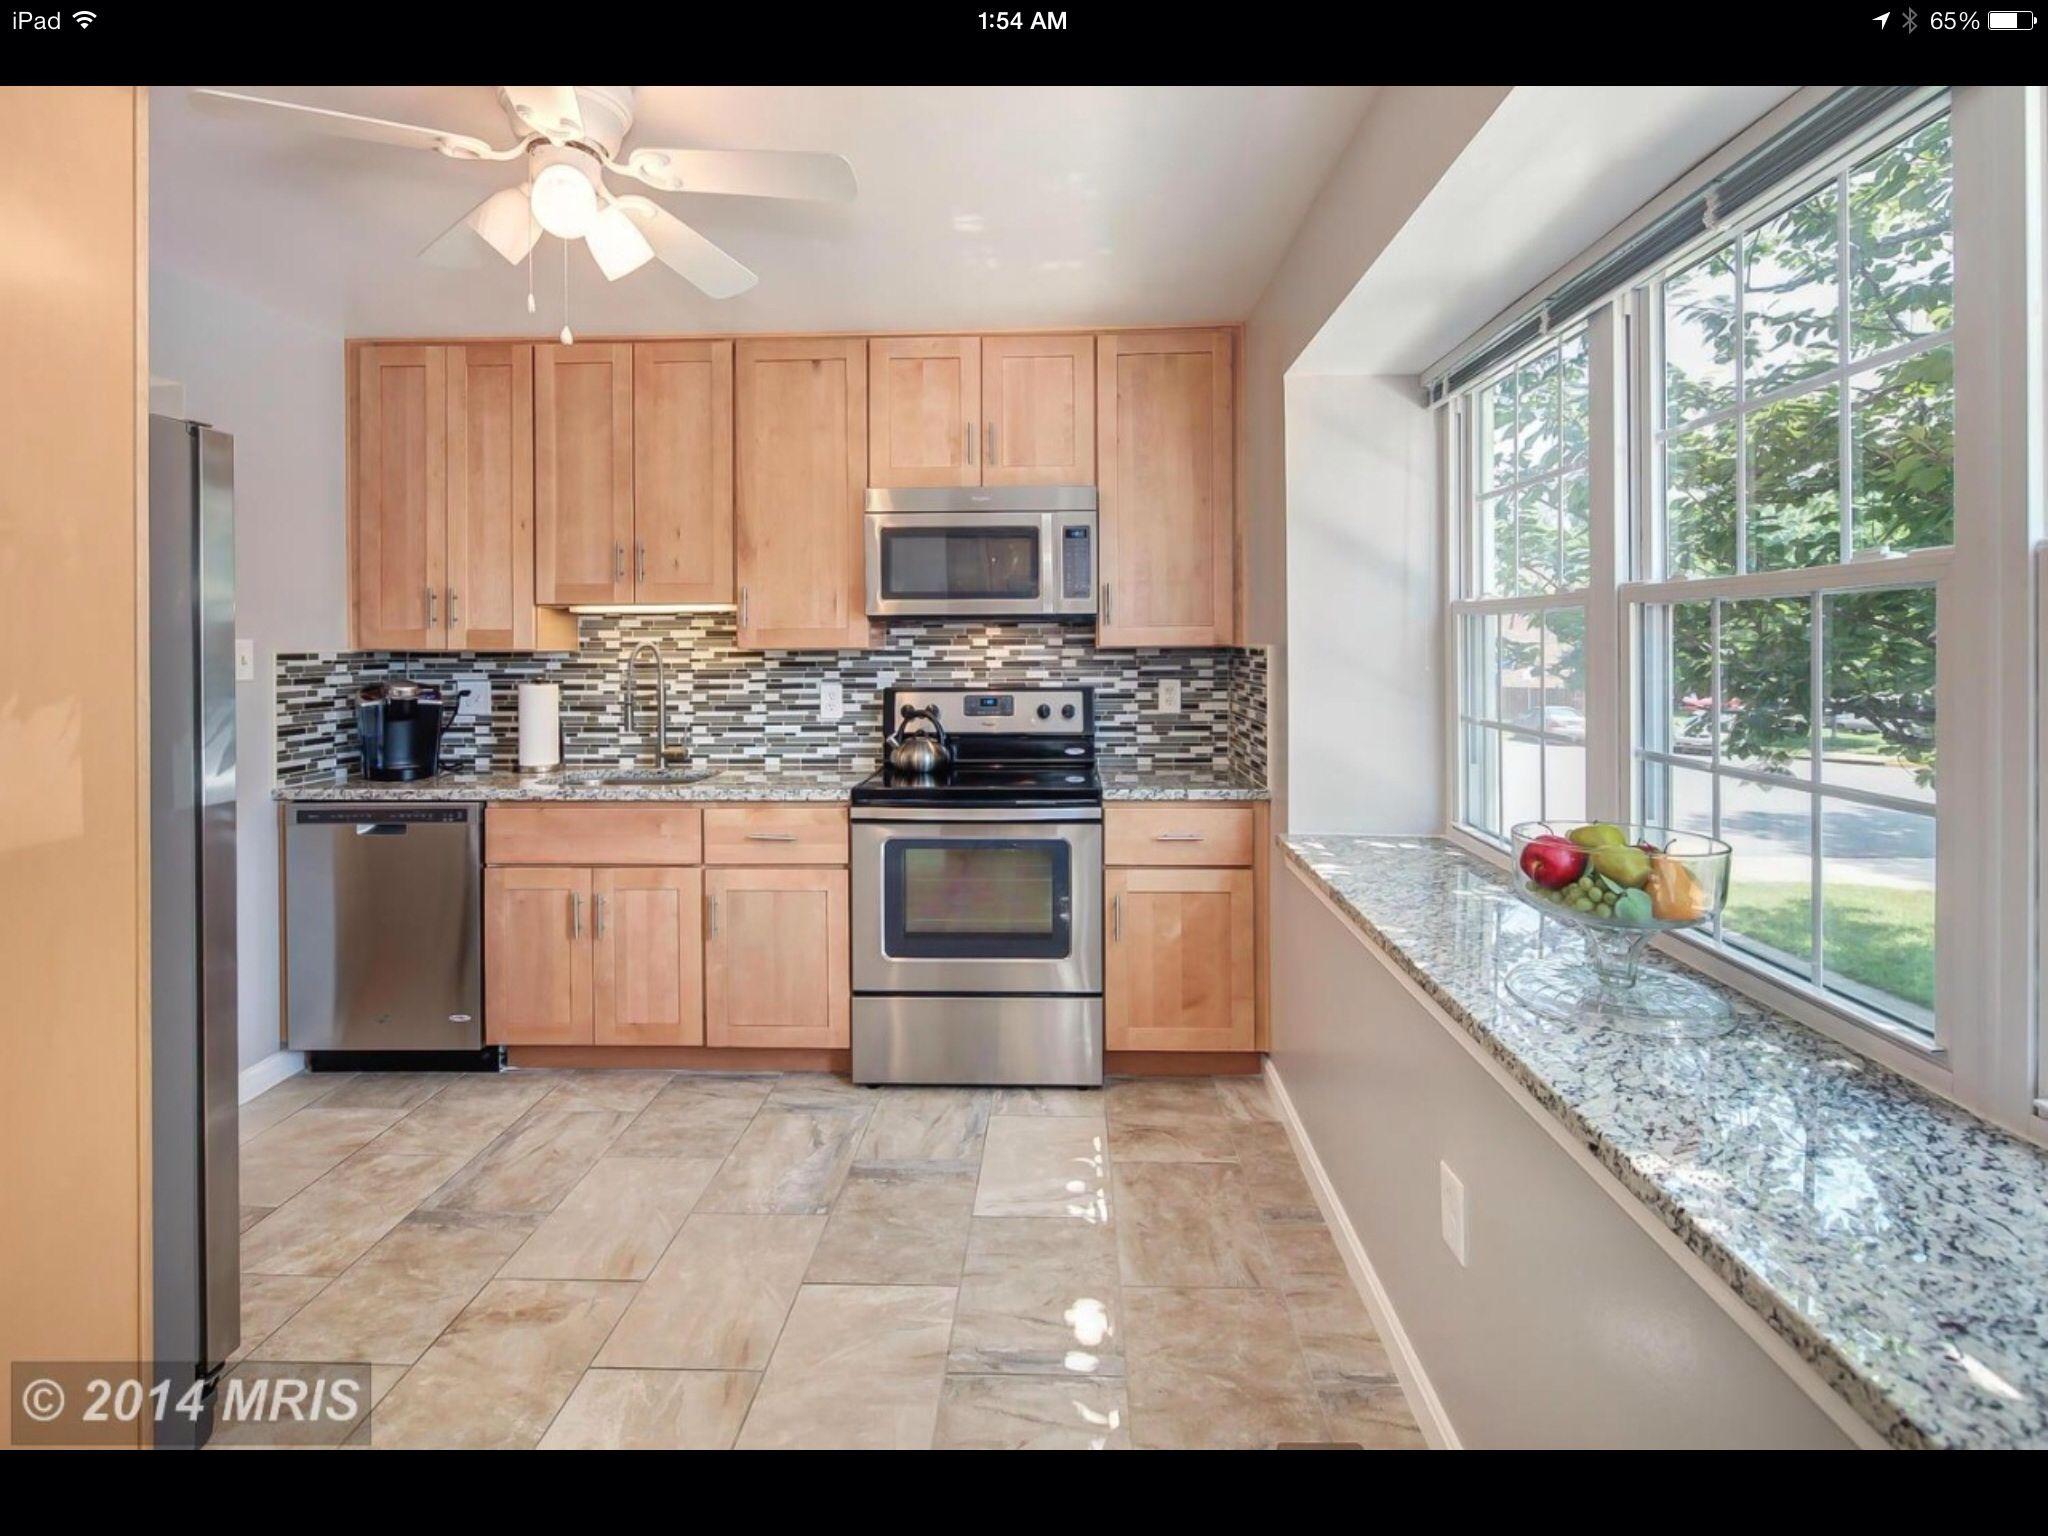 42 inch cabinets | Kitchen, Cabinet, Home decor